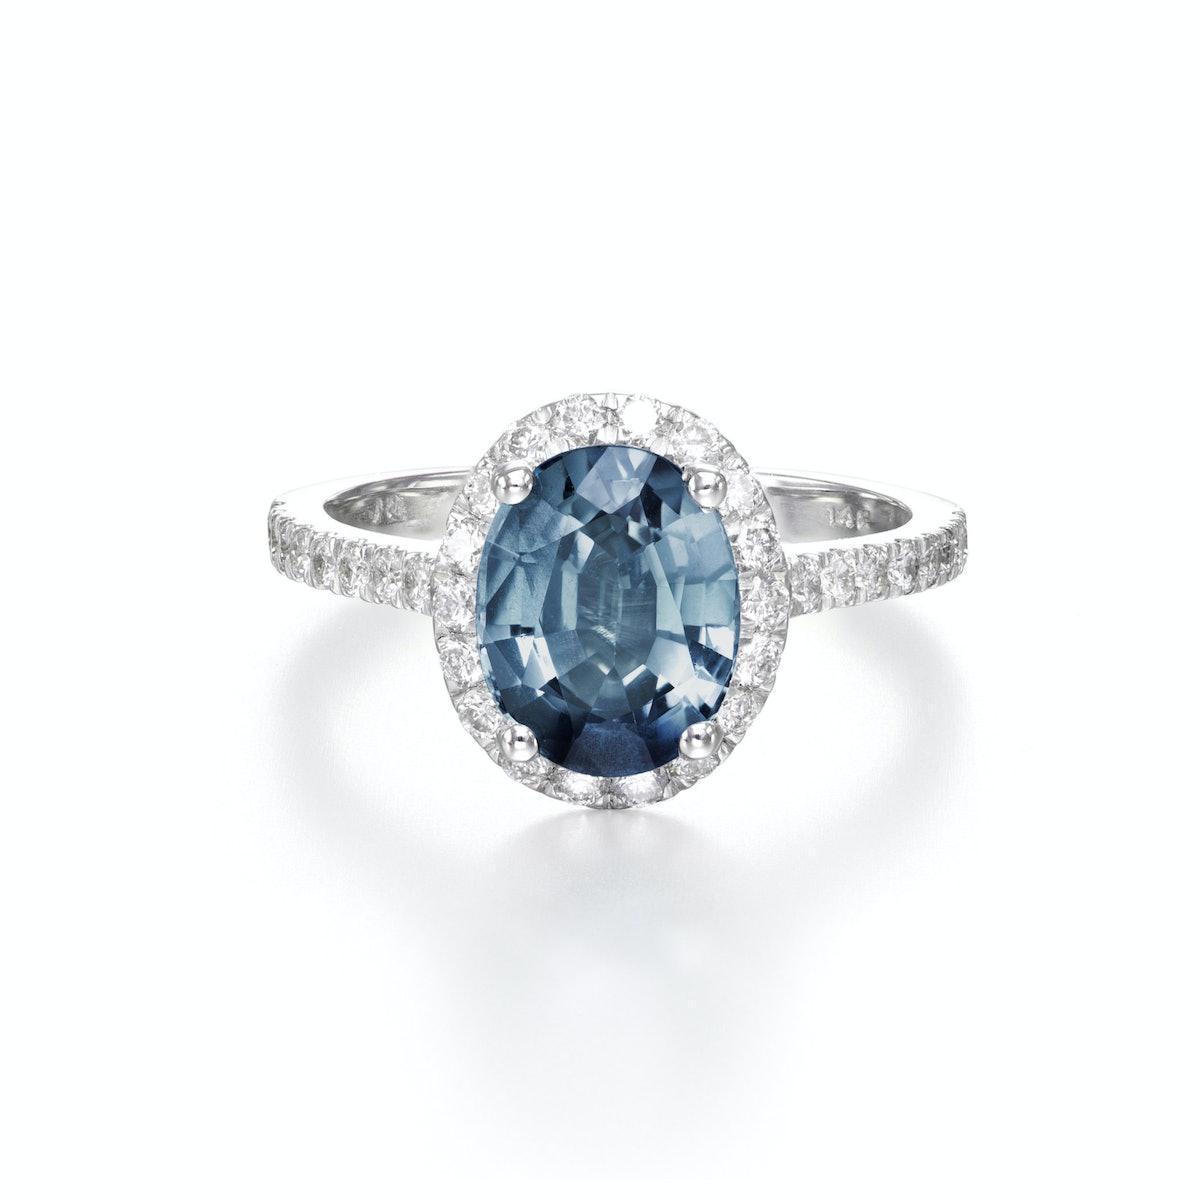 Sea Blue Sapphire and Diamond engagement ring from Sheryl Jones.